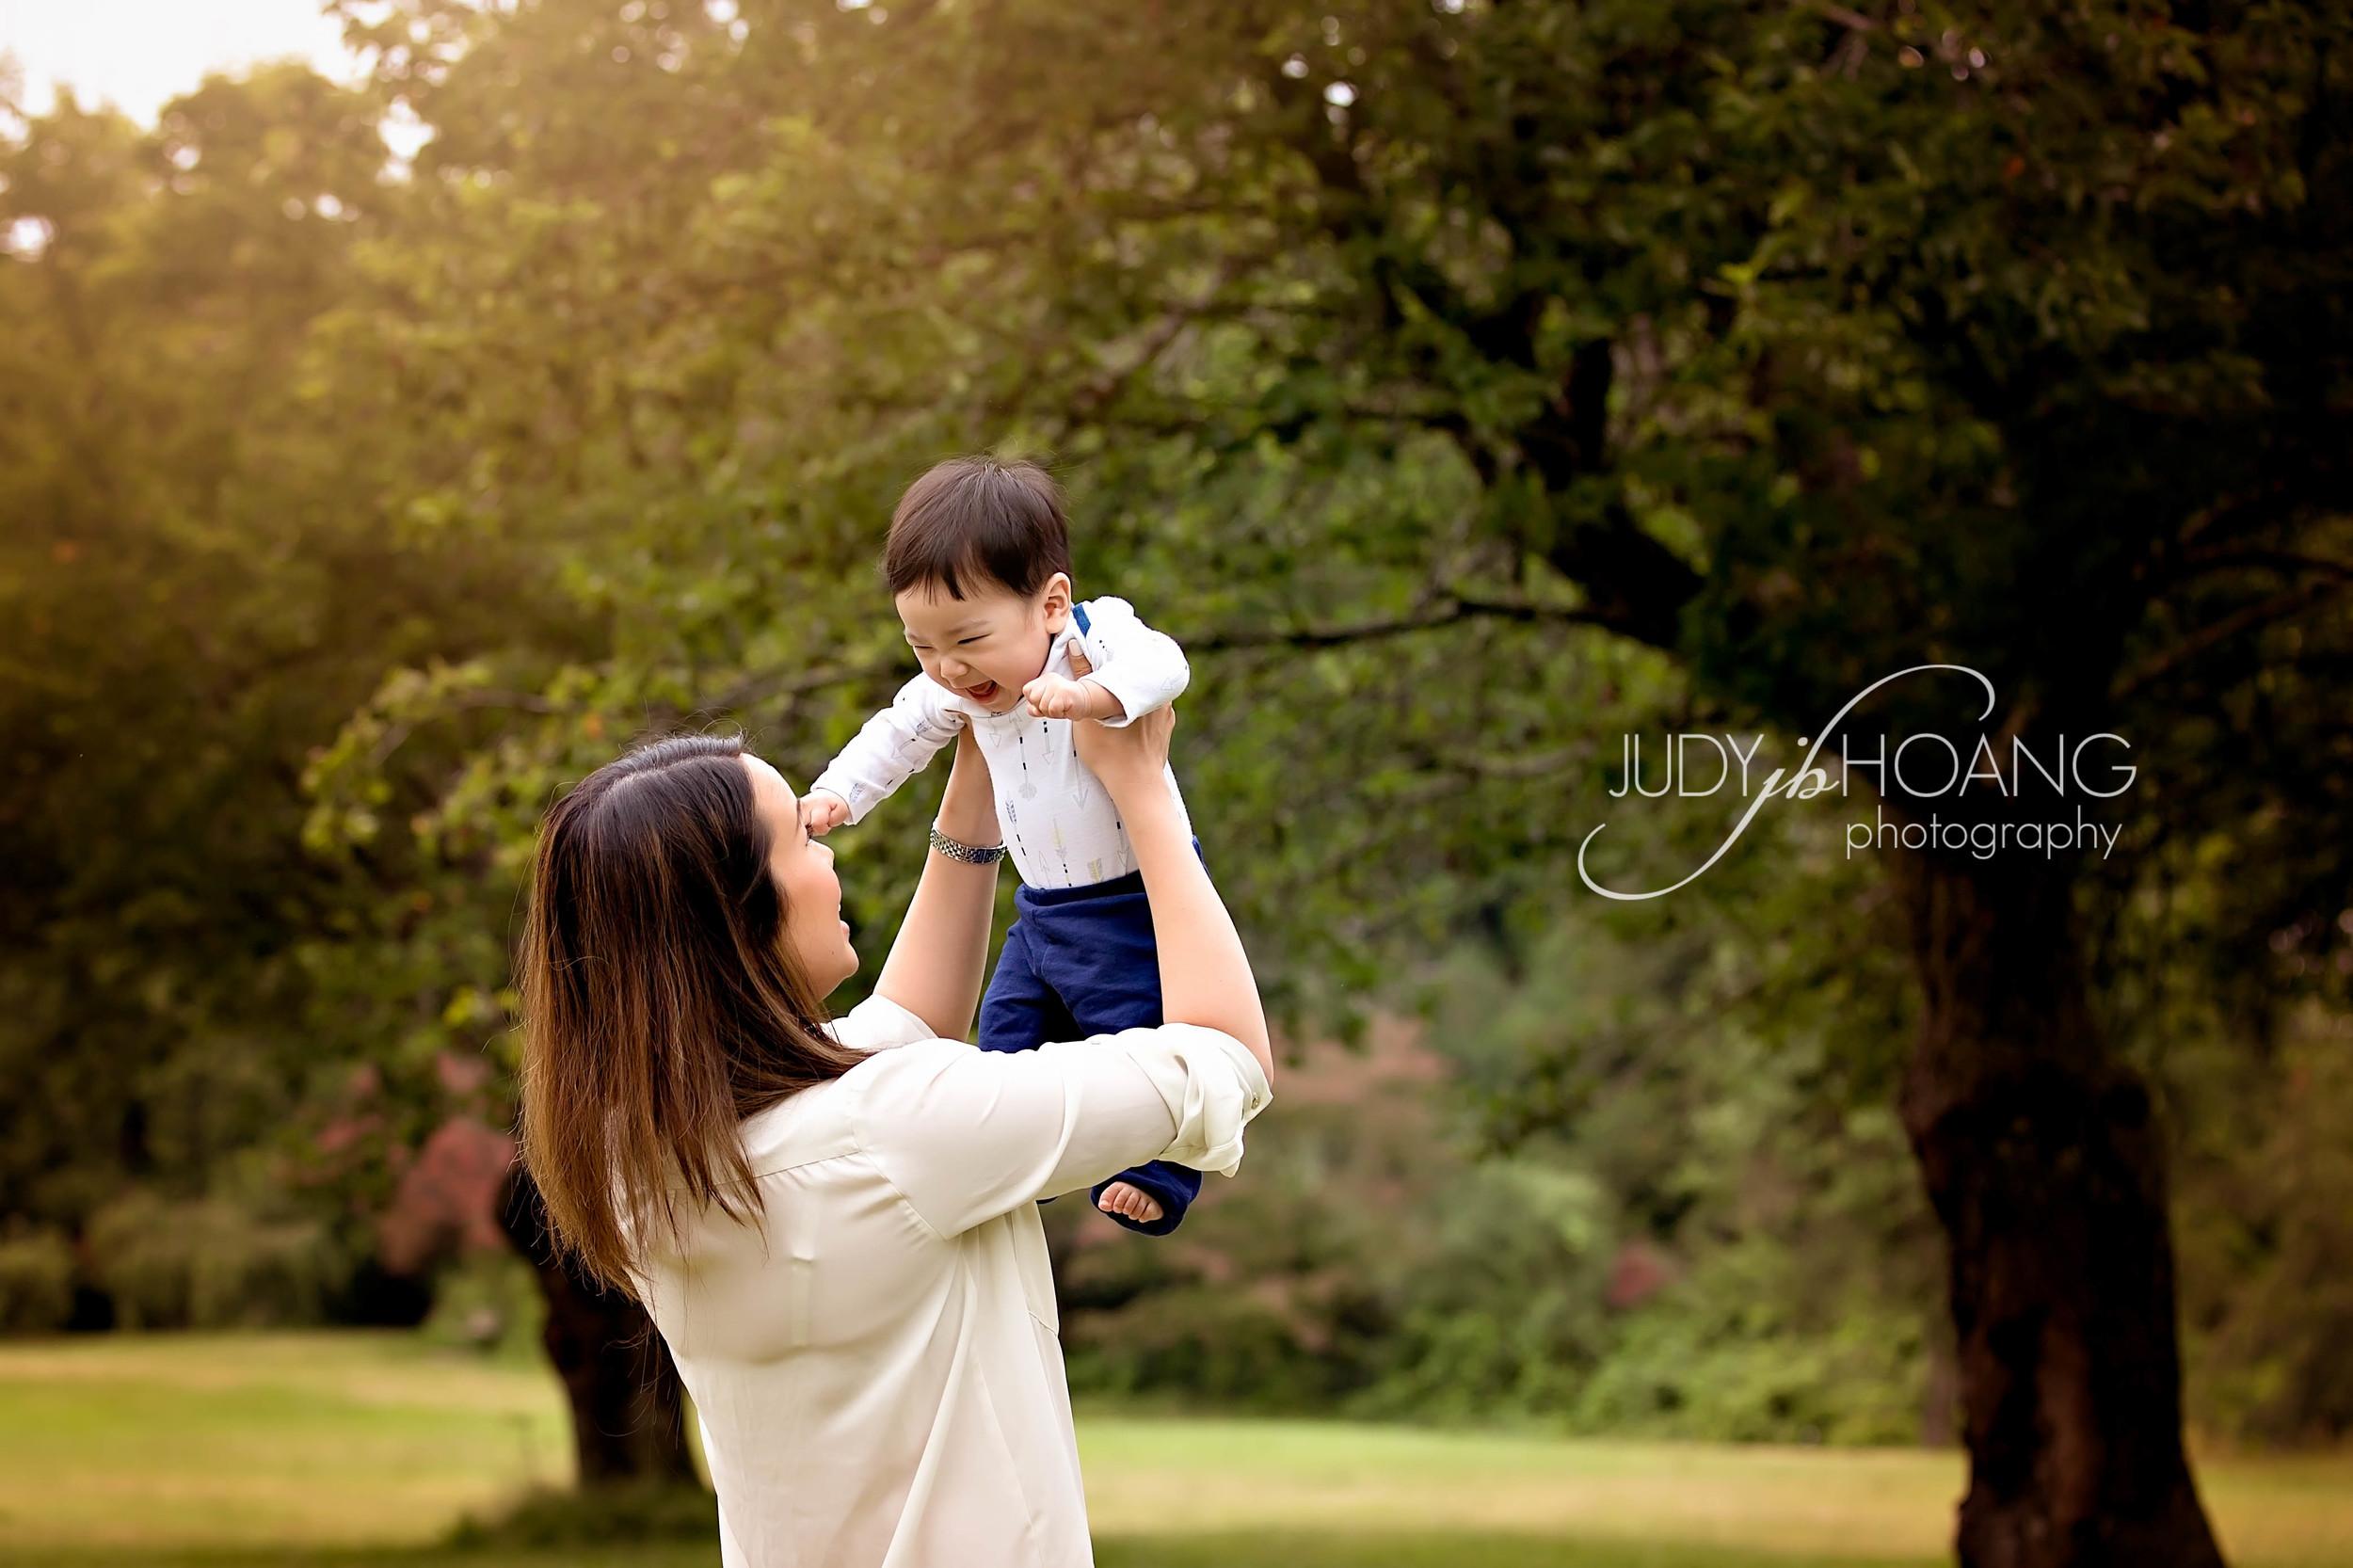 Judy Hoang Photography - Warran Sneak Peek-1.JPG